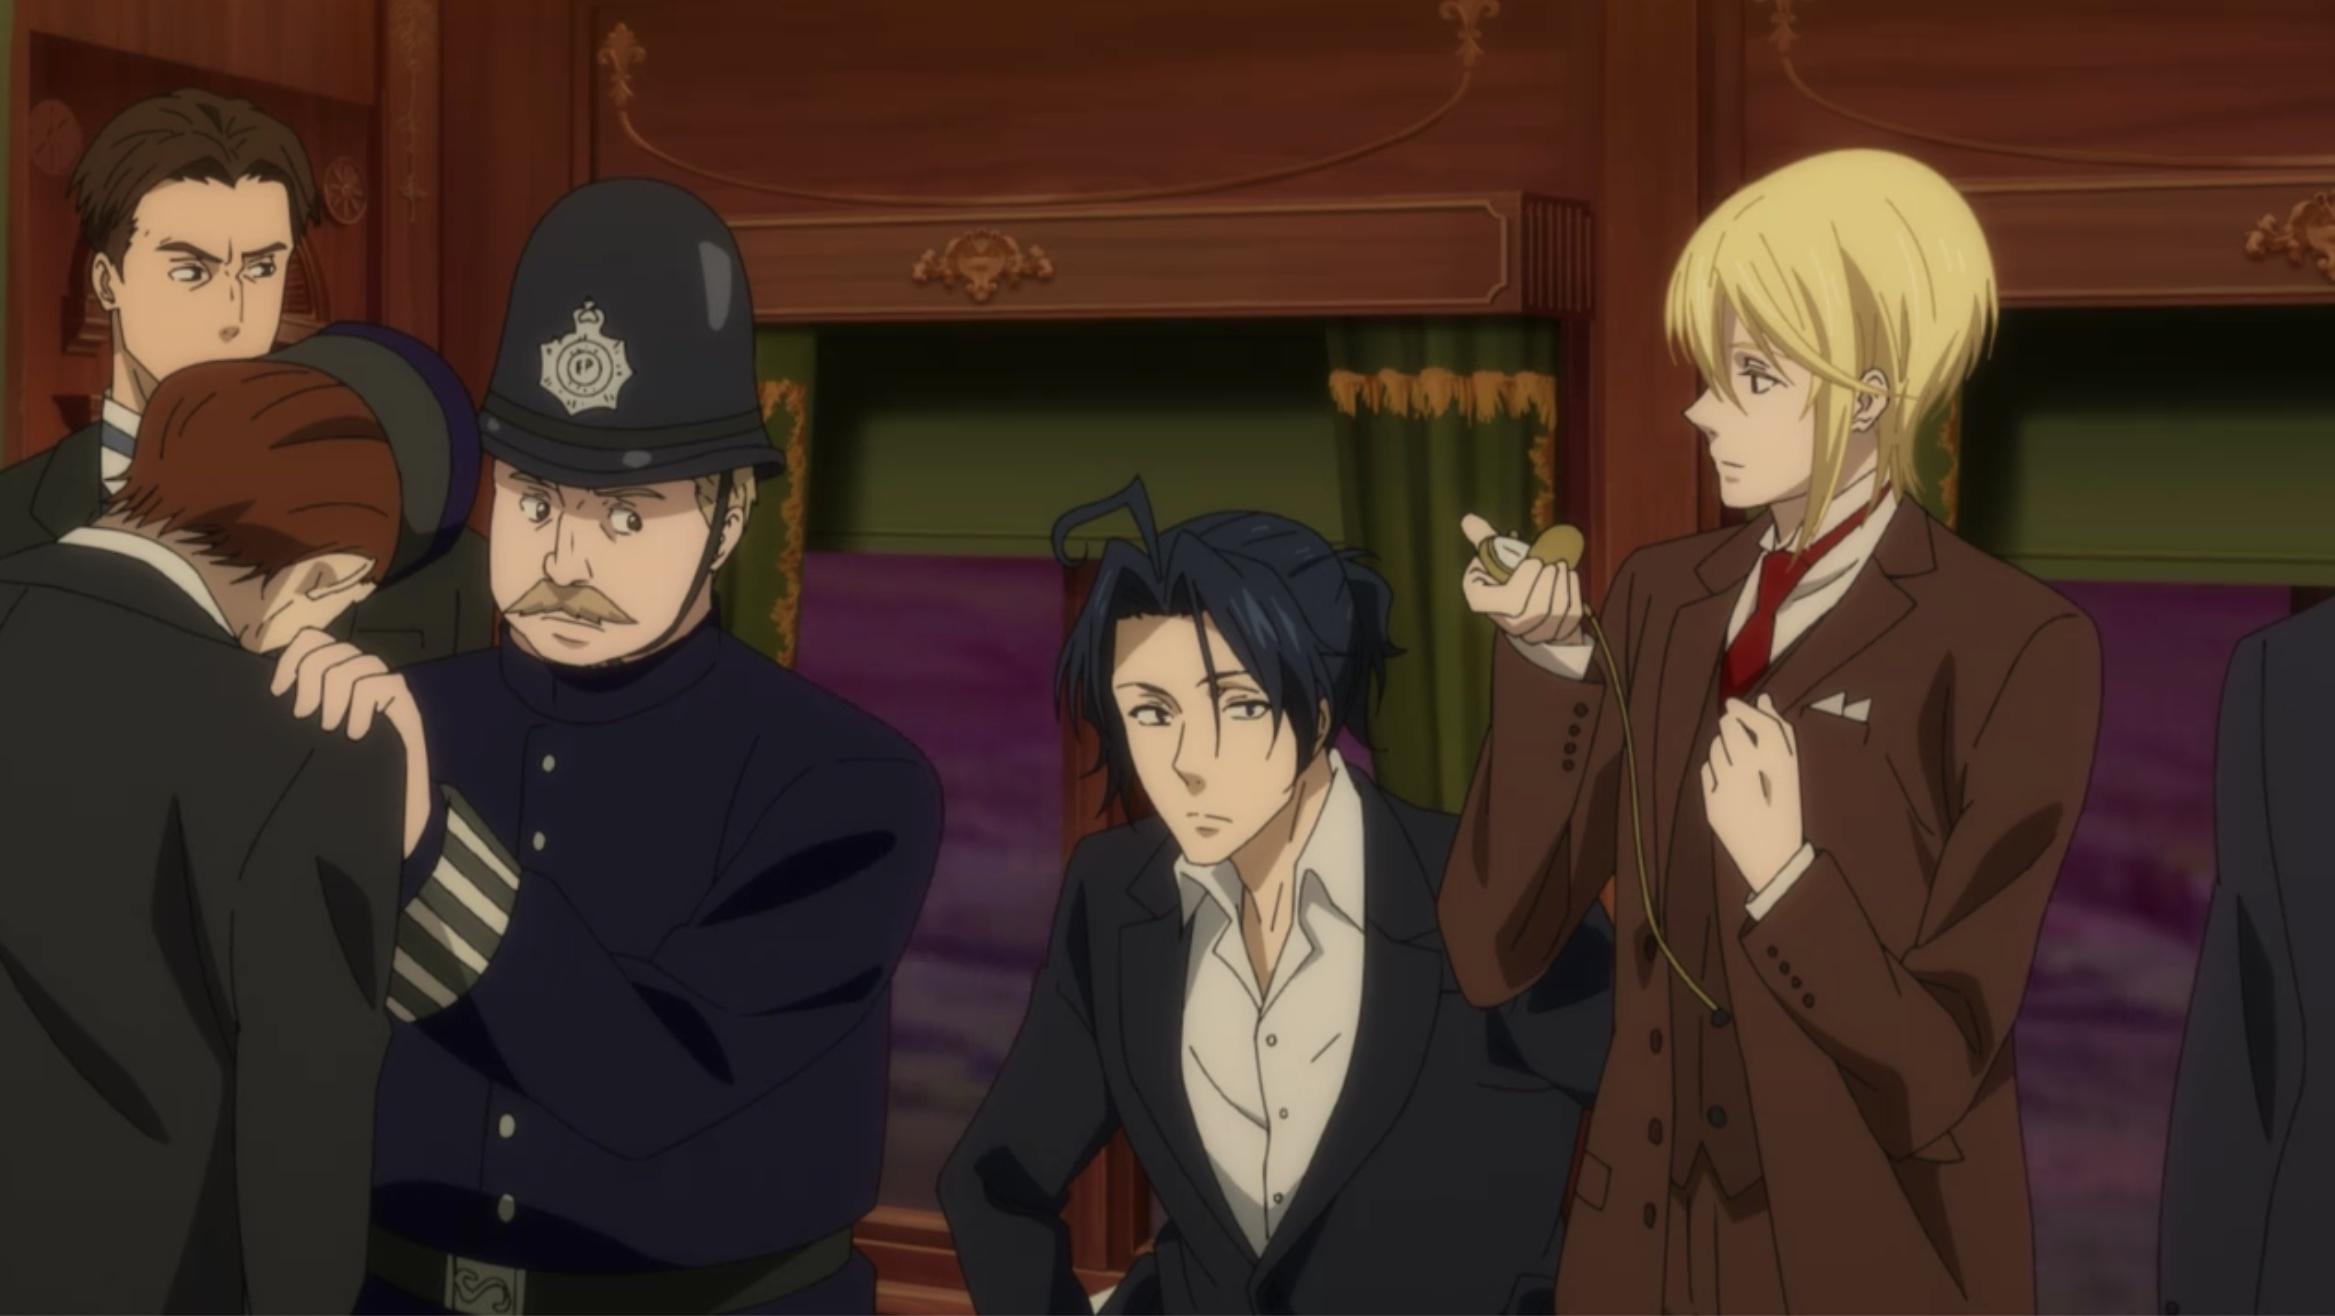 TVアニメ「憂国のモリアーティ」第11話「二人の探偵 第二幕」